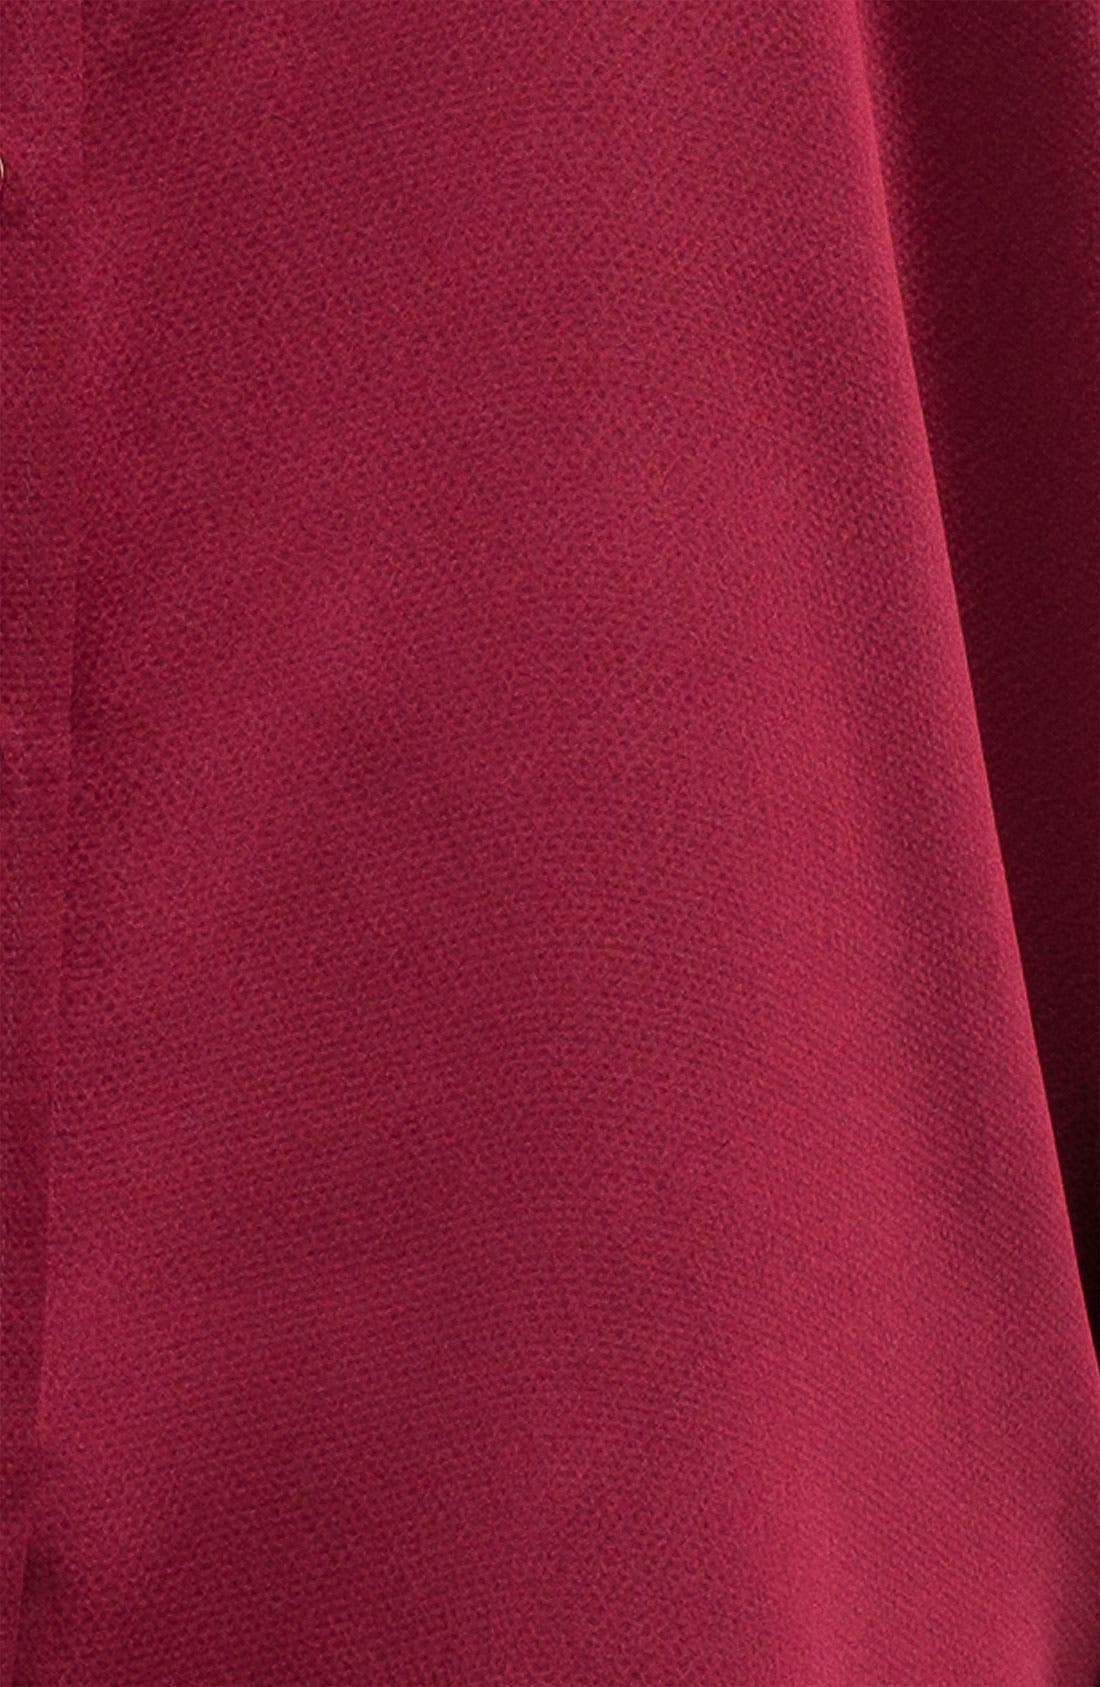 Alternate Image 3  - Eileen Fisher Hammered Silk Satin Blouse (Plus)